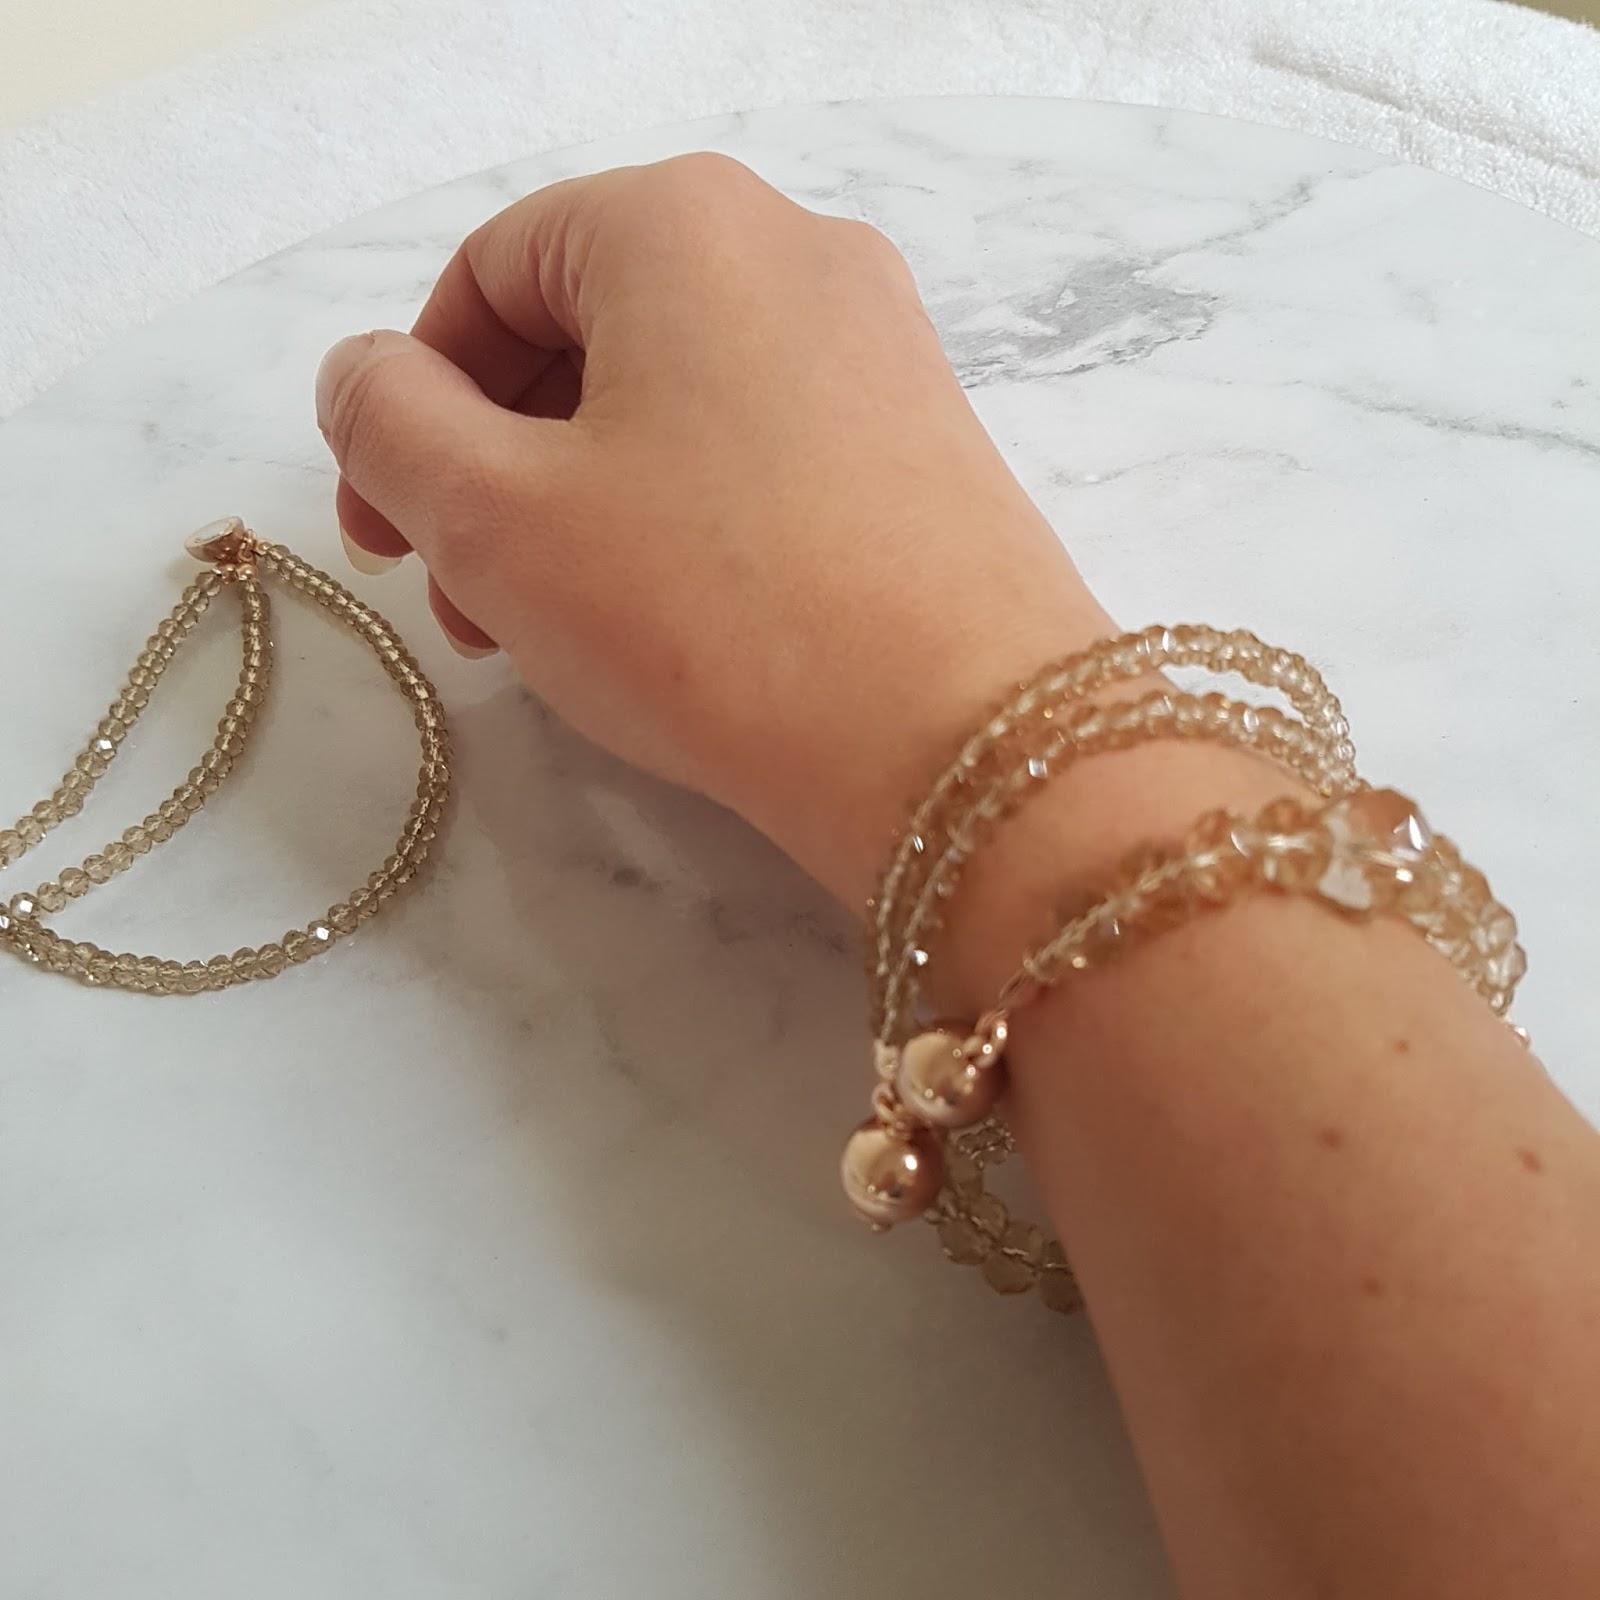 Posh Picks Maria Nicola 10 Way Necklace Almost Posh